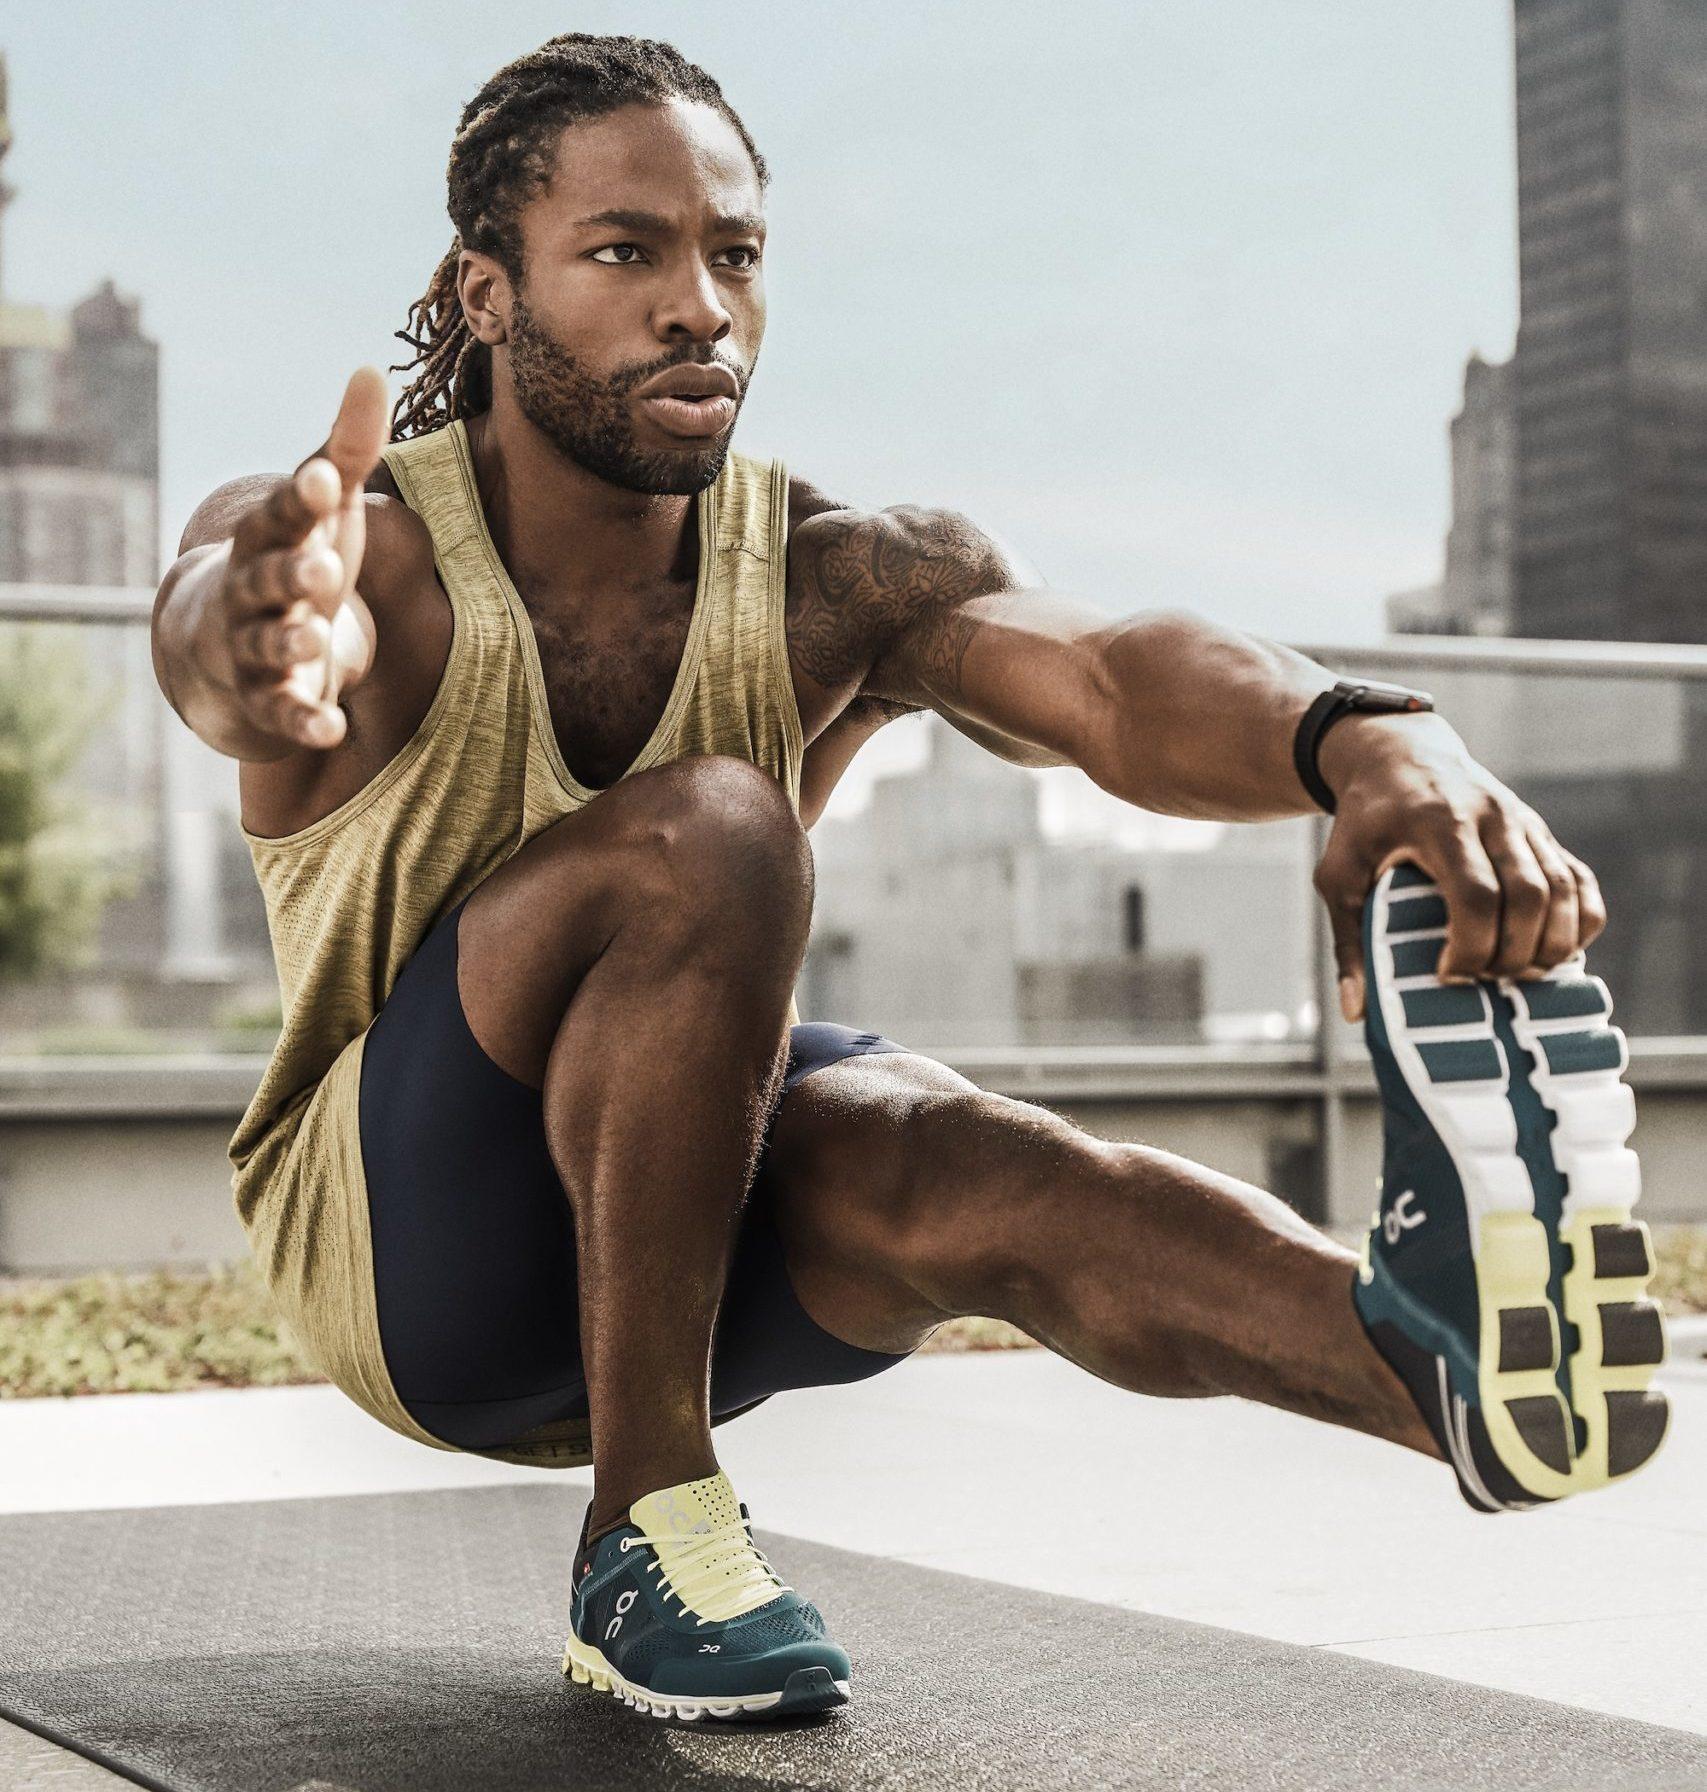 DSC1336ret Layers copy scaled e1588007796687 - fitness, face-time - Bakari Williams -  - Bakari Williams